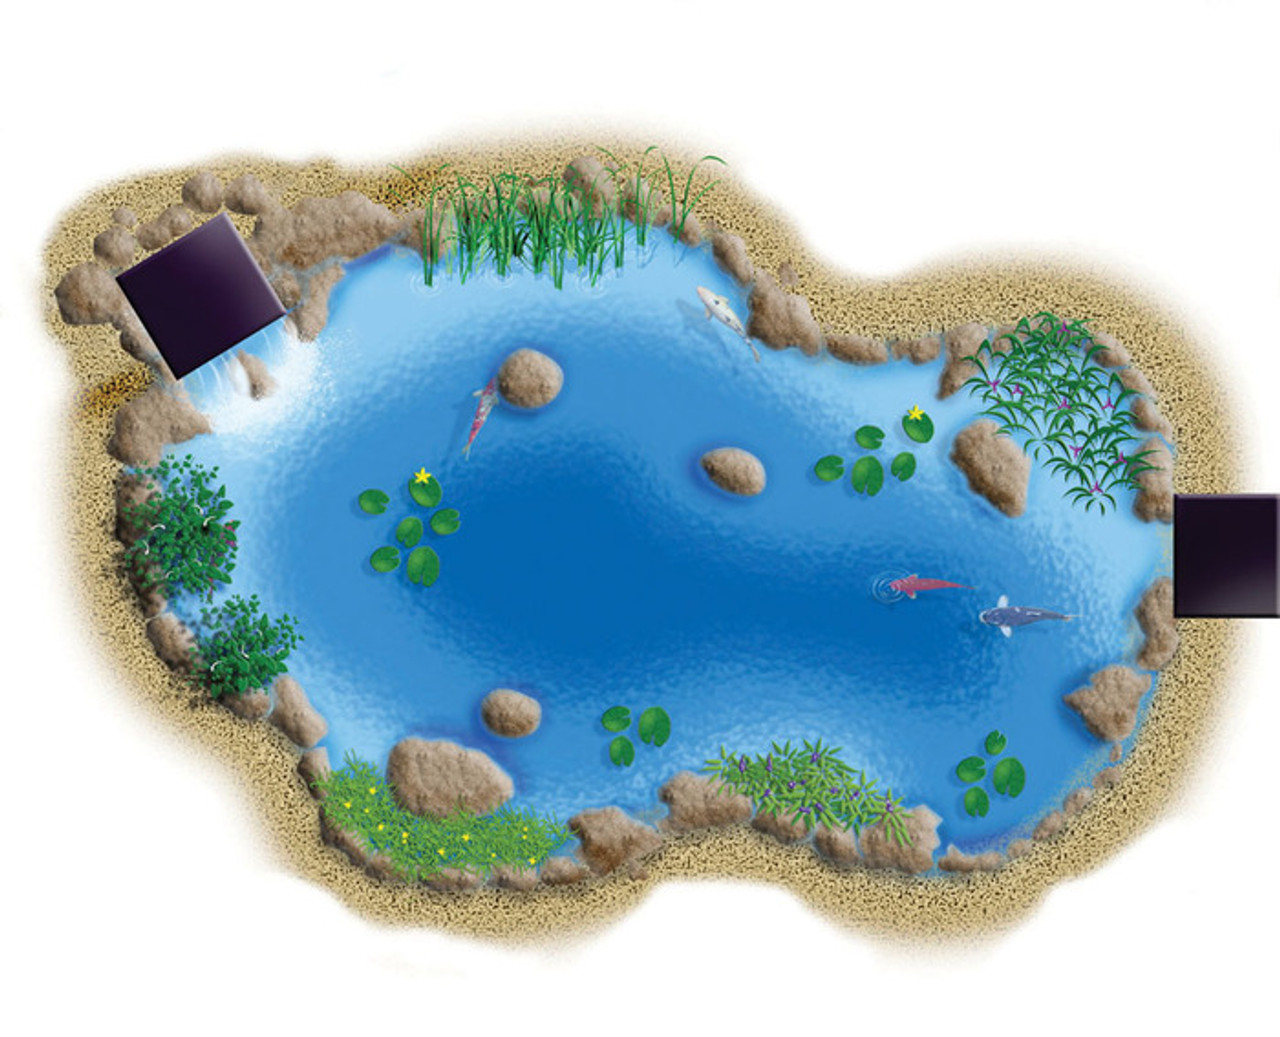 Aquascape Medium Pond Kit - 11' x 16' (3000 GPH Pump)